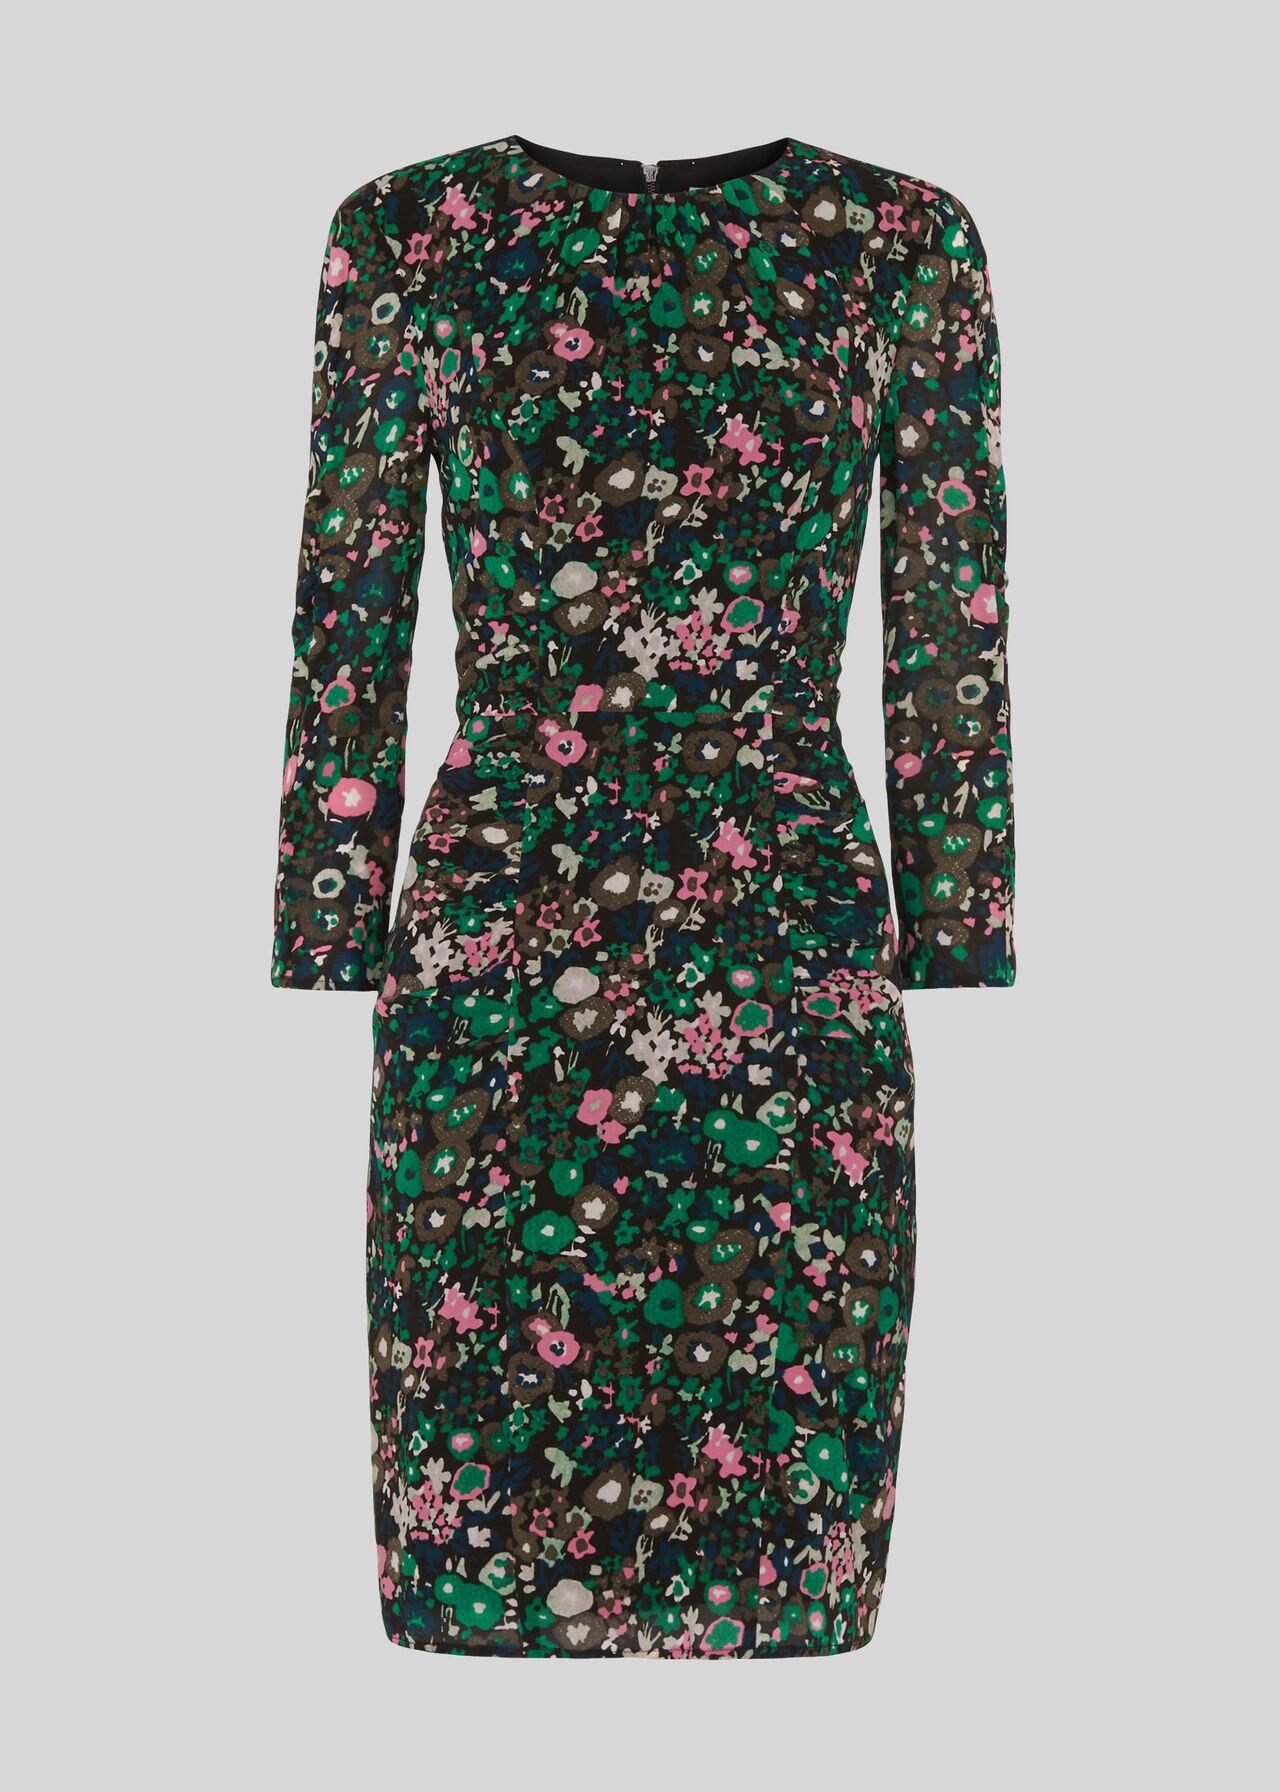 Adelaide Print Silk Bodycon Pink/Multi